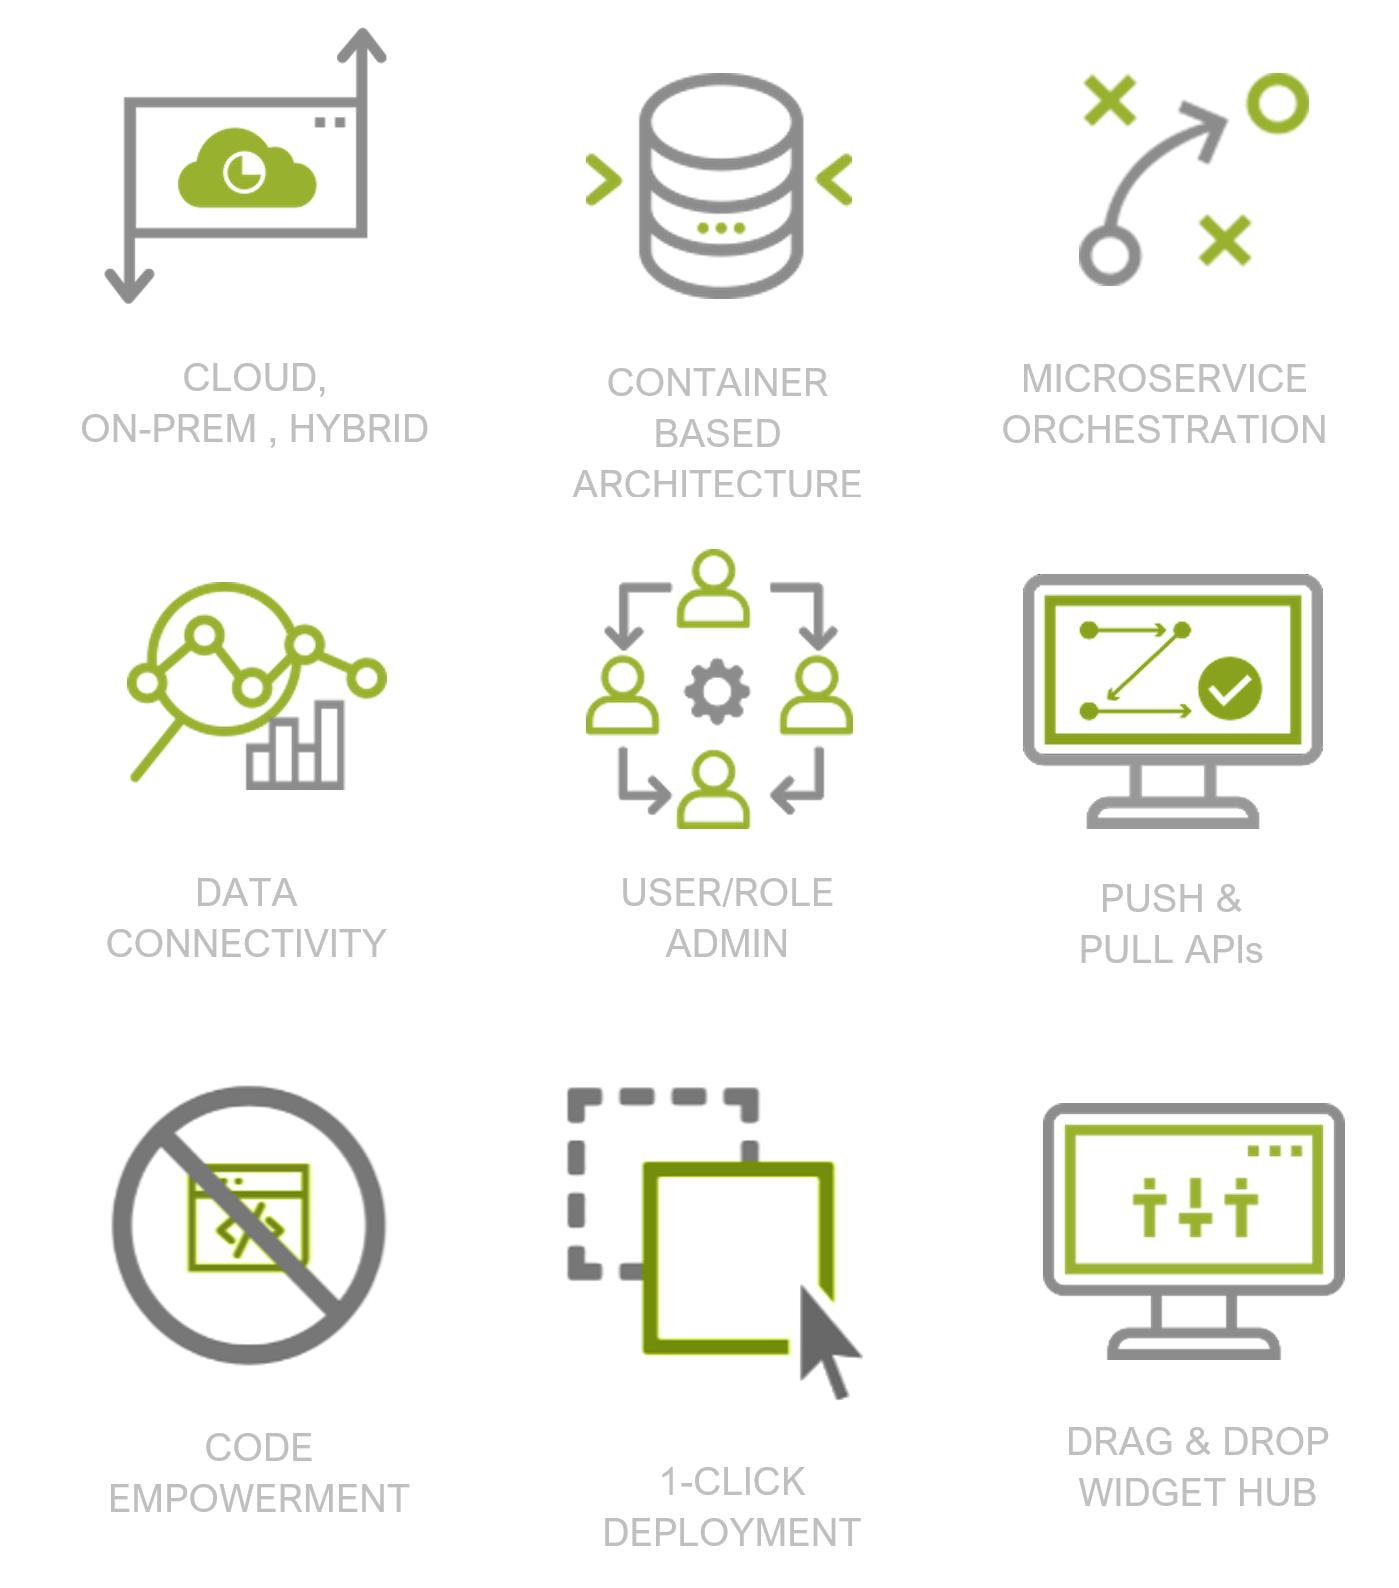 Platform Features Icons